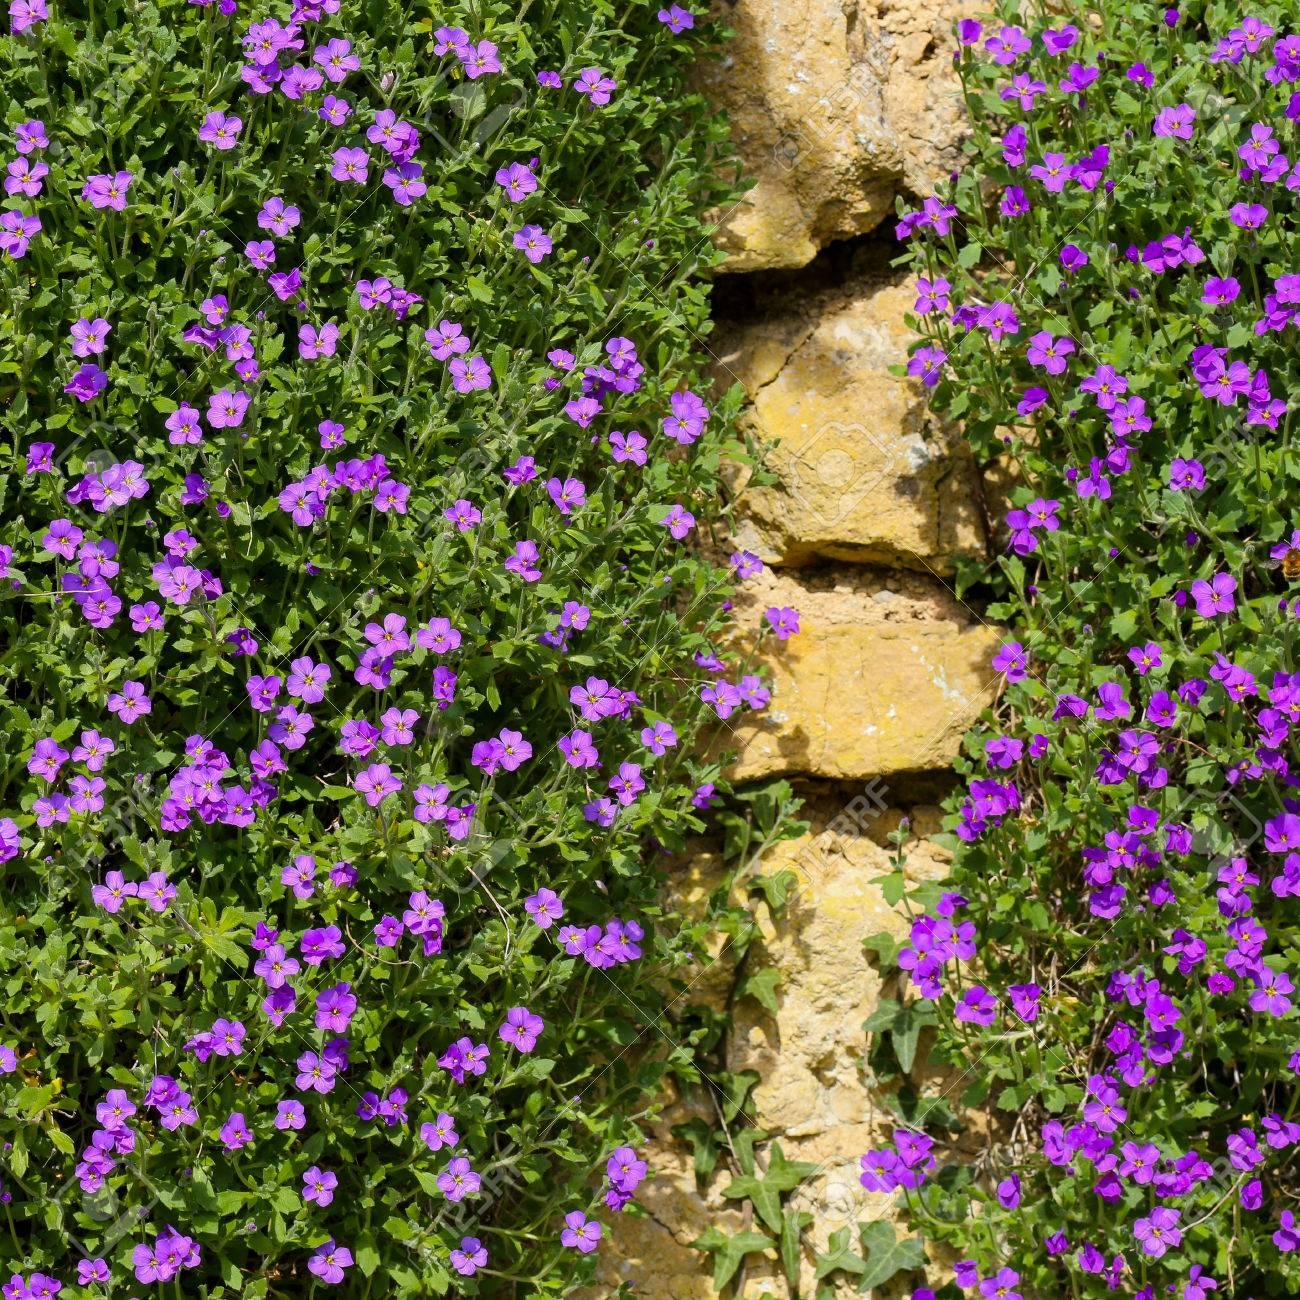 Lobelia Erinus Small Purple Magenta Flowers On The Stone Wall